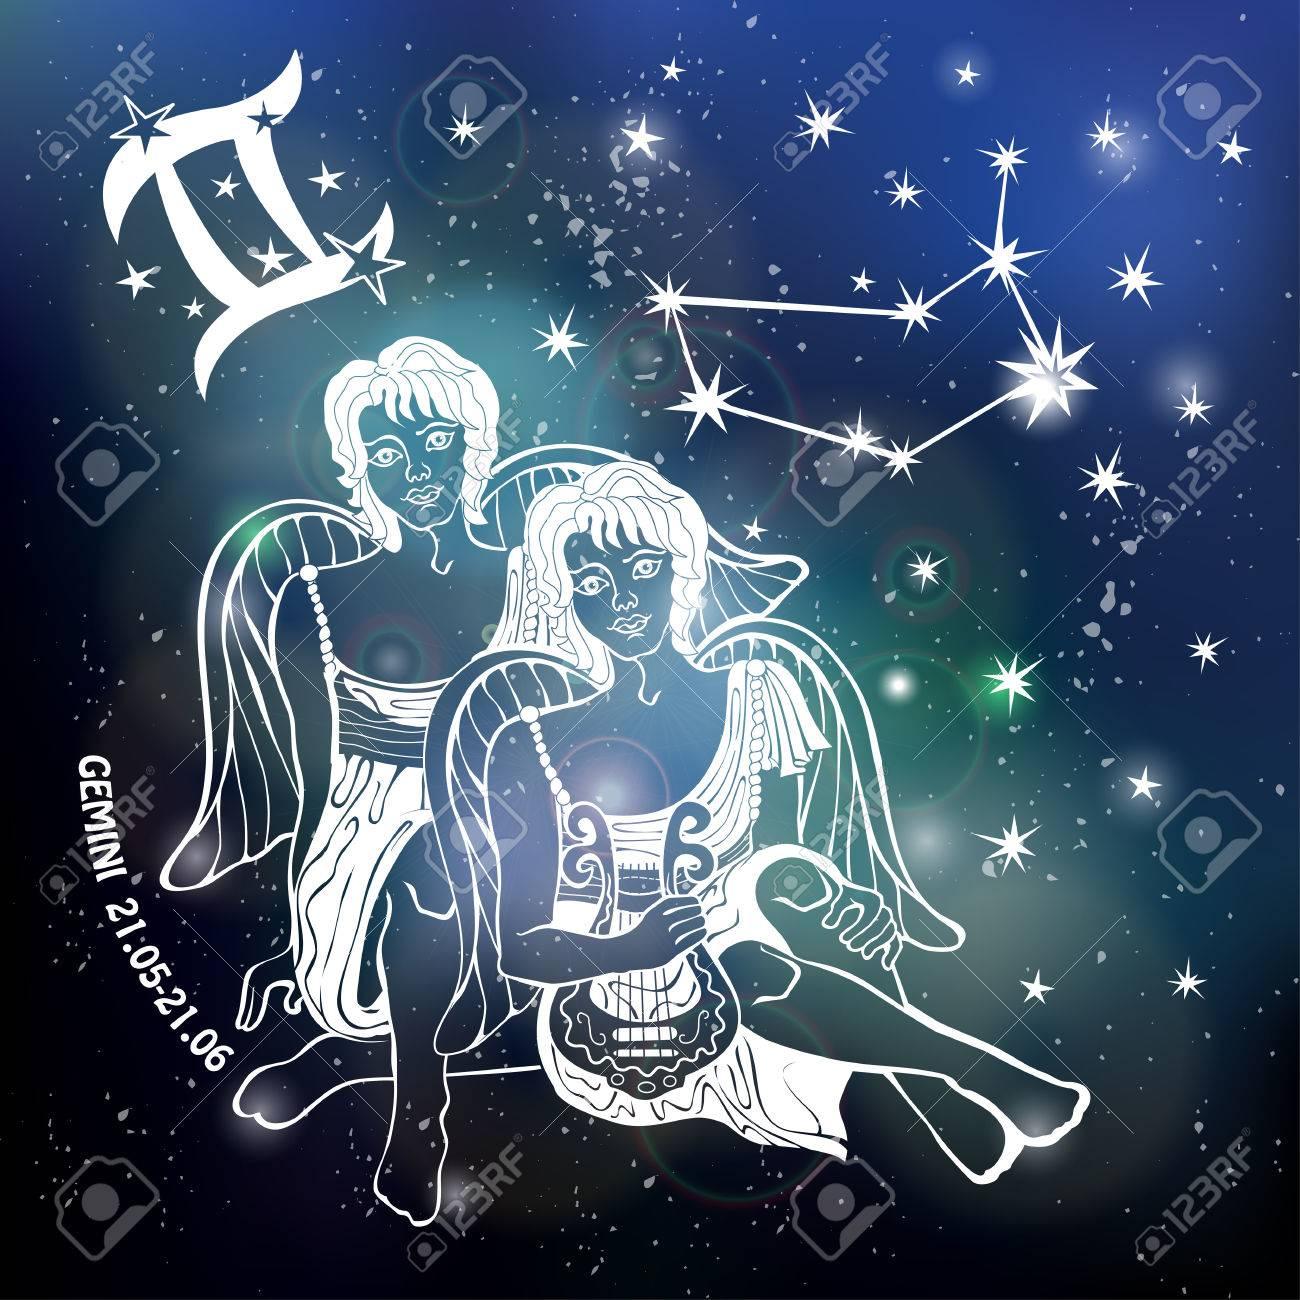 Gemini zodiac signin horoscope constellationstarsabstract gemini zodiac signin horoscope constellationstarsabstract space dark sky blurred background buycottarizona